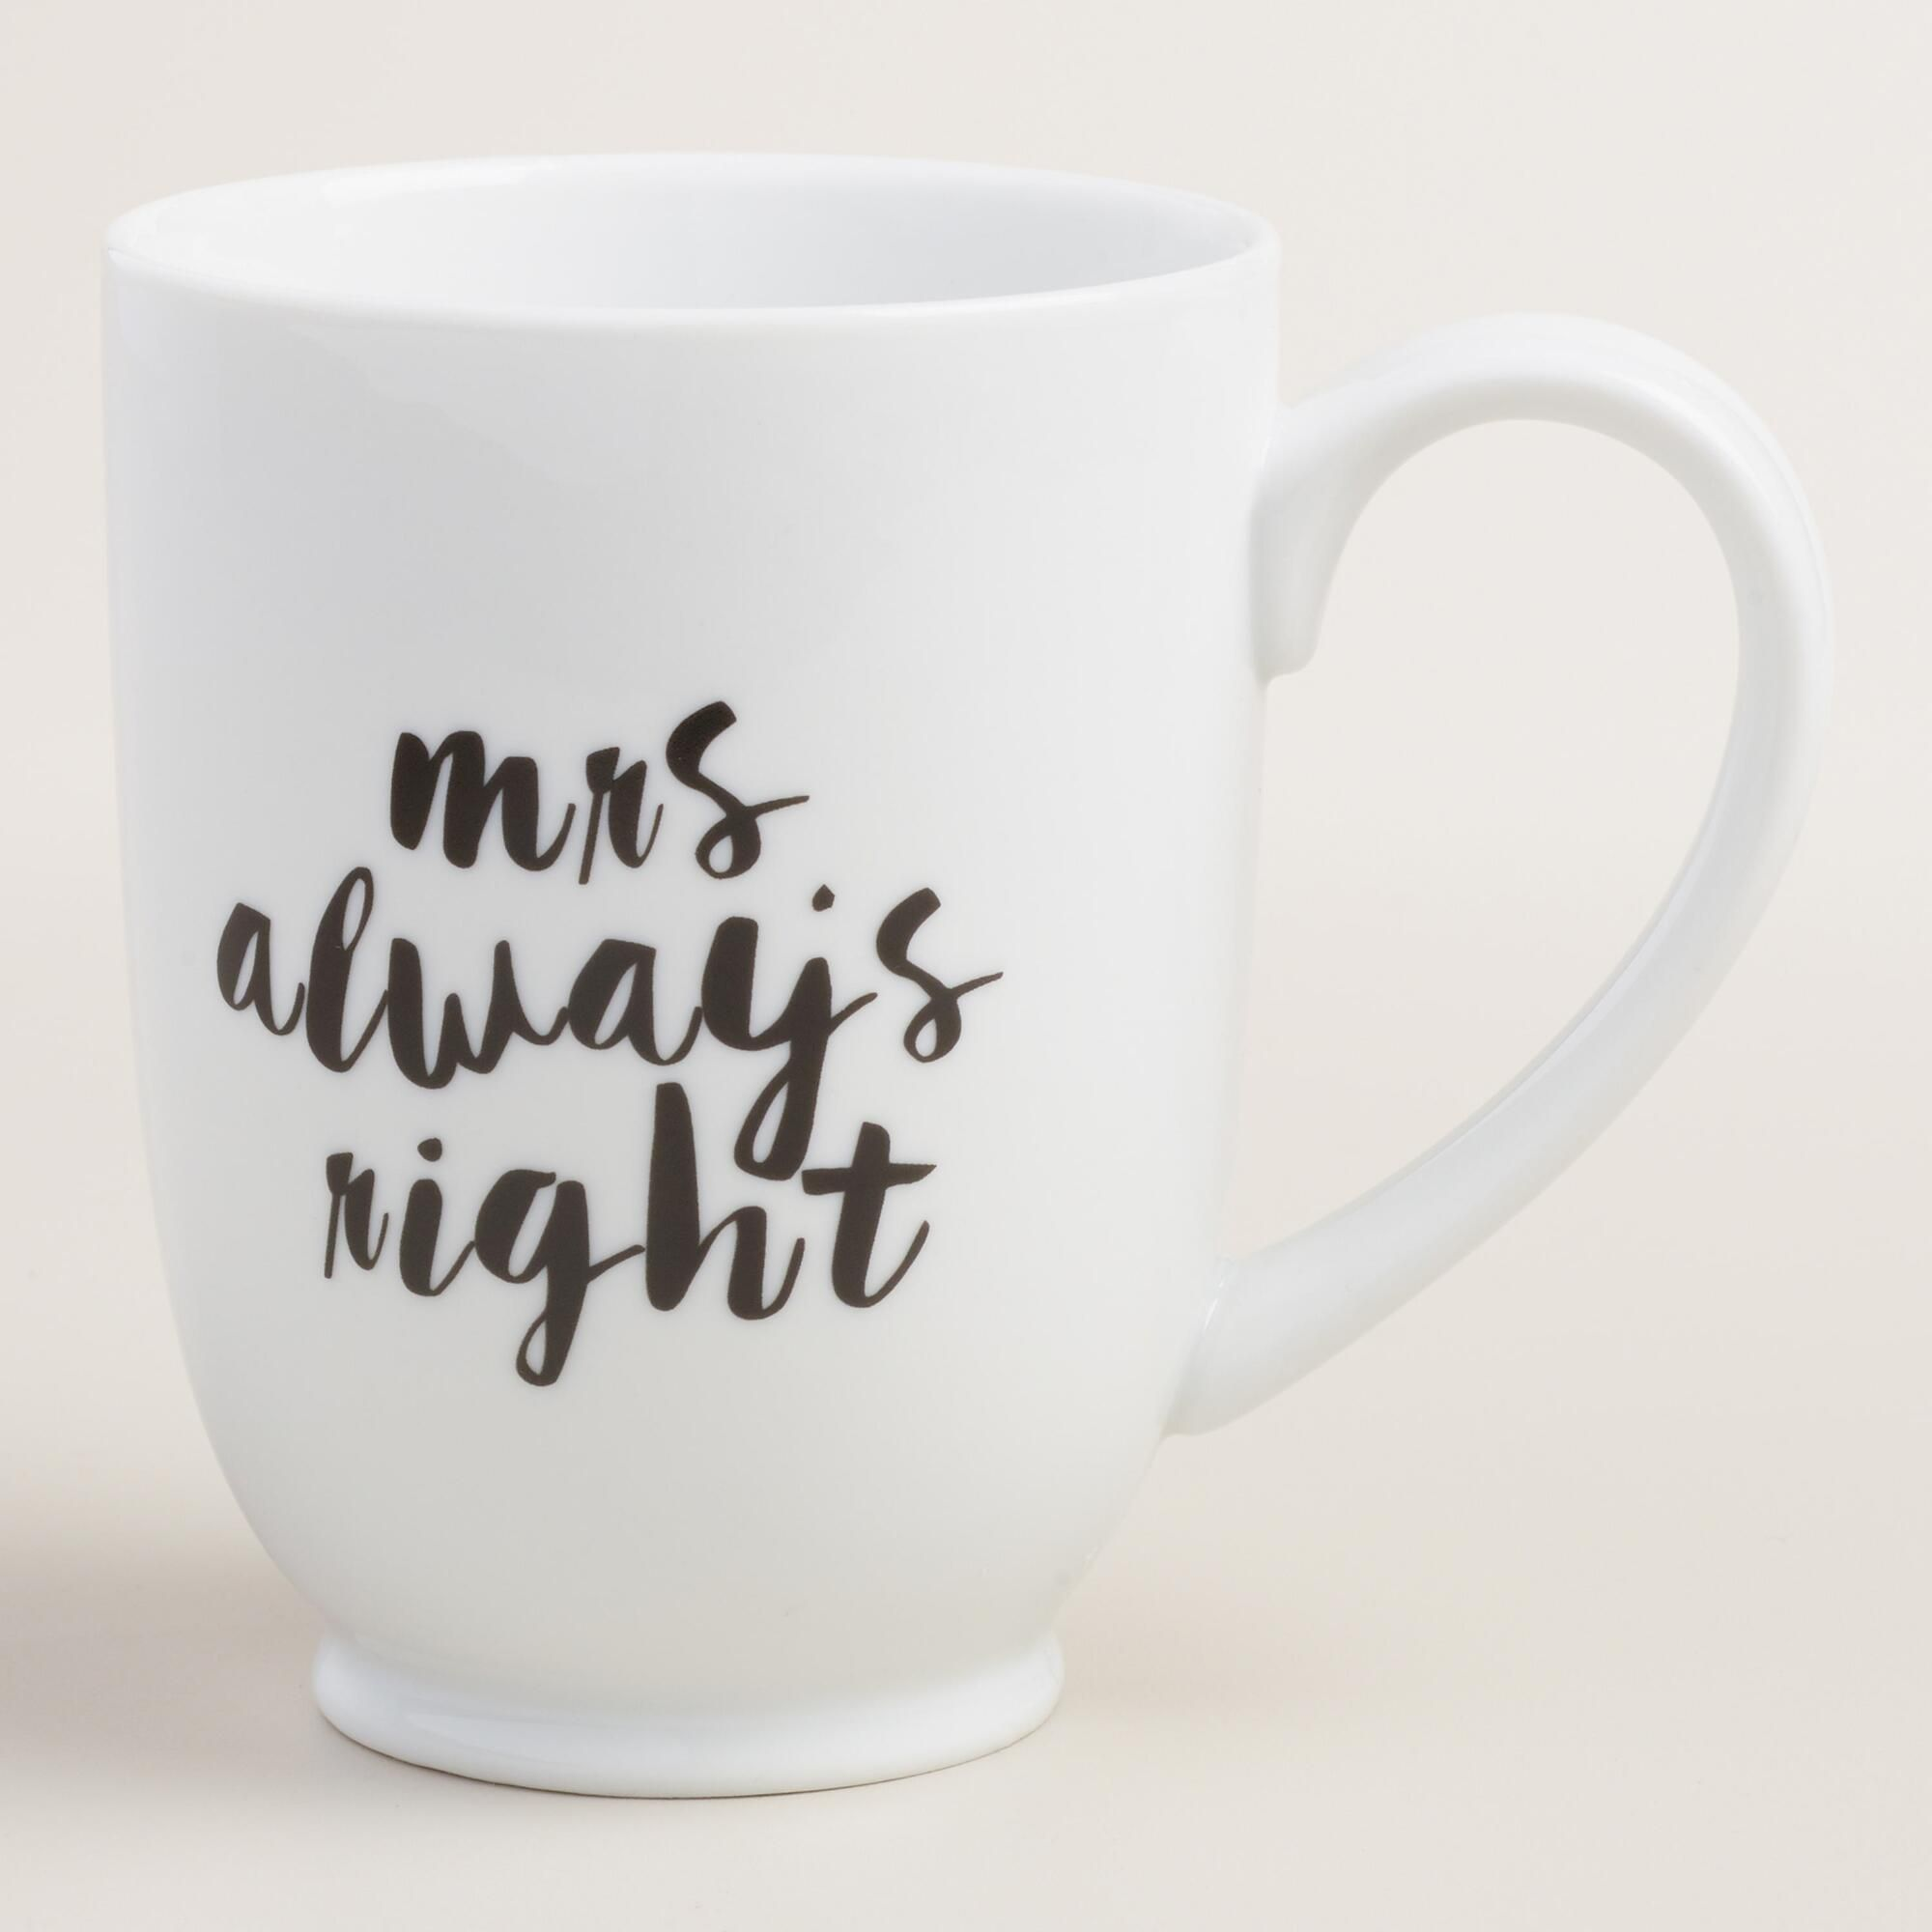 Mrs. Always Right Mug Mugs, Unique coffee mugs